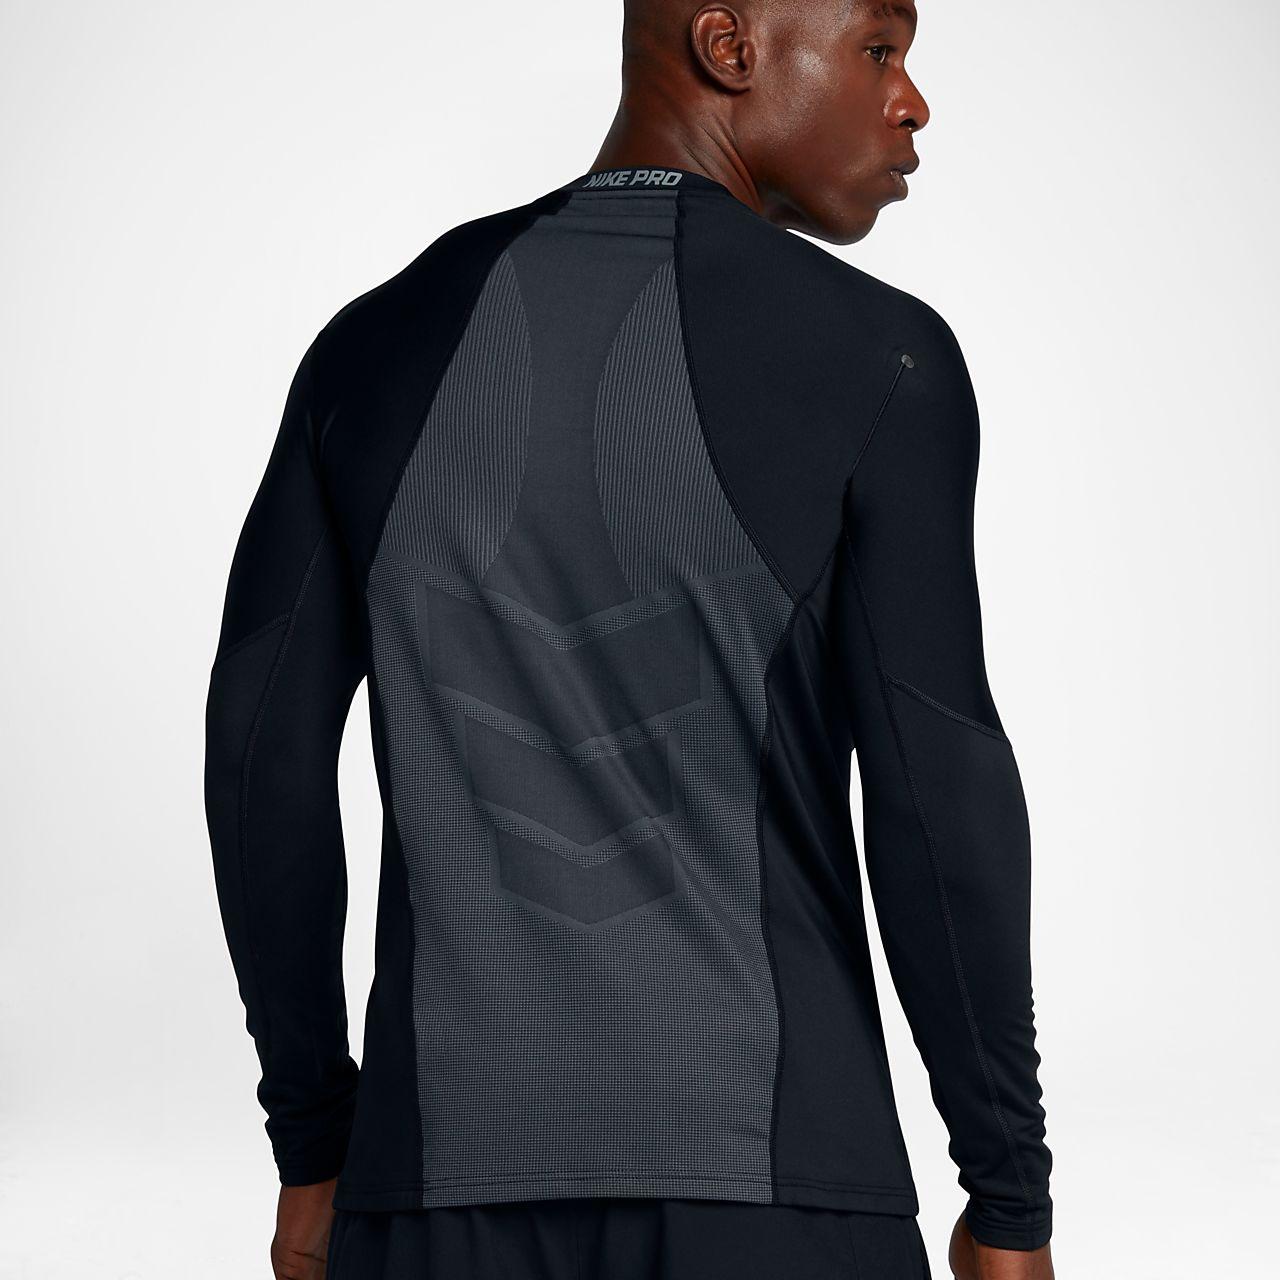 Nike Pro Men's Long Sleeve Training Top Black/Cool Grey